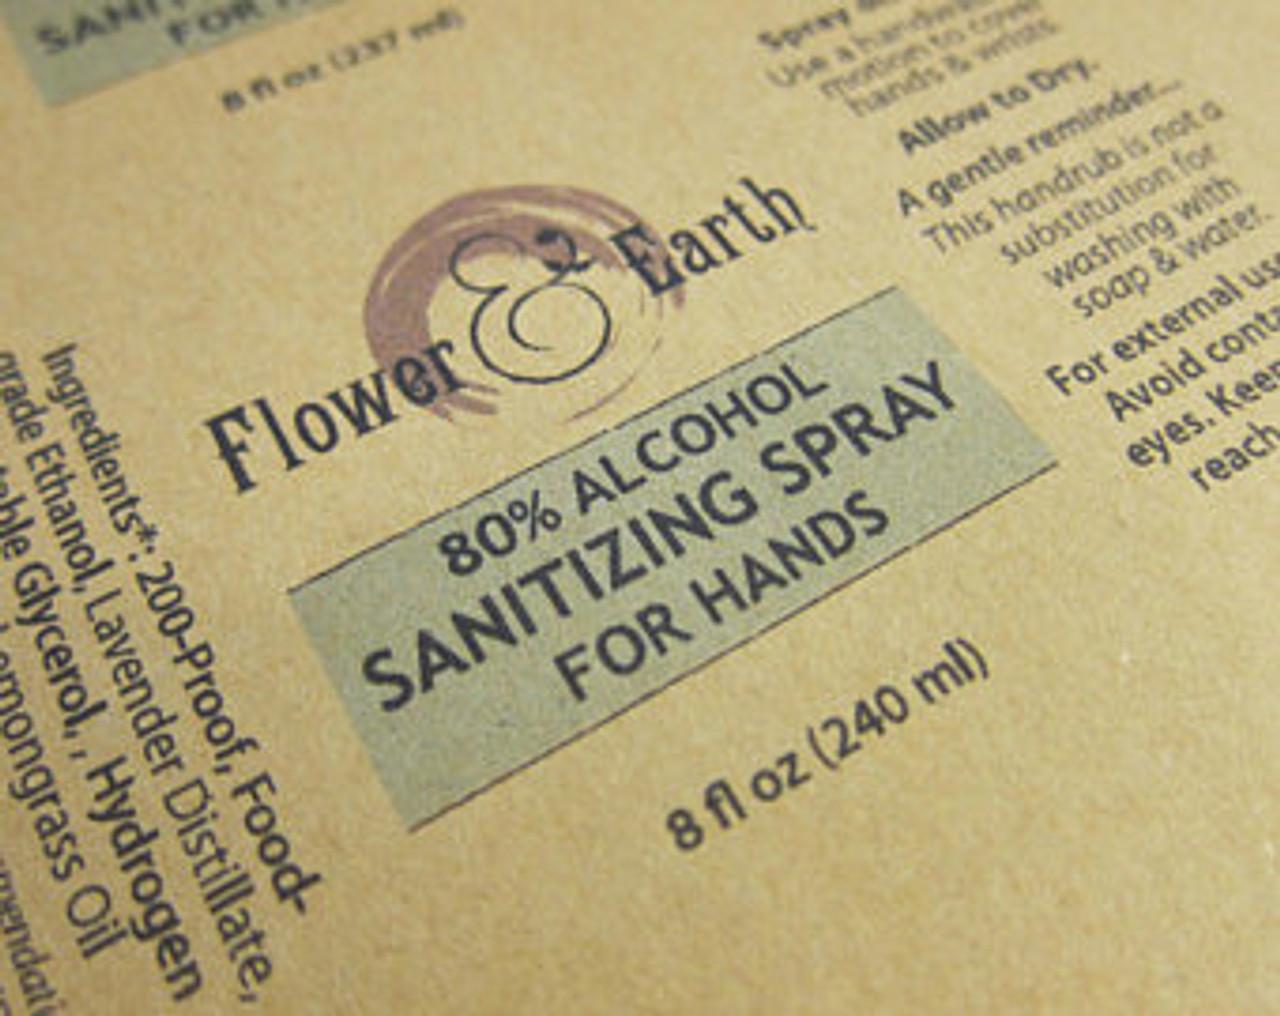 Flower & Earth 80% Alcohol Hand Sanitizing Spray 8oz